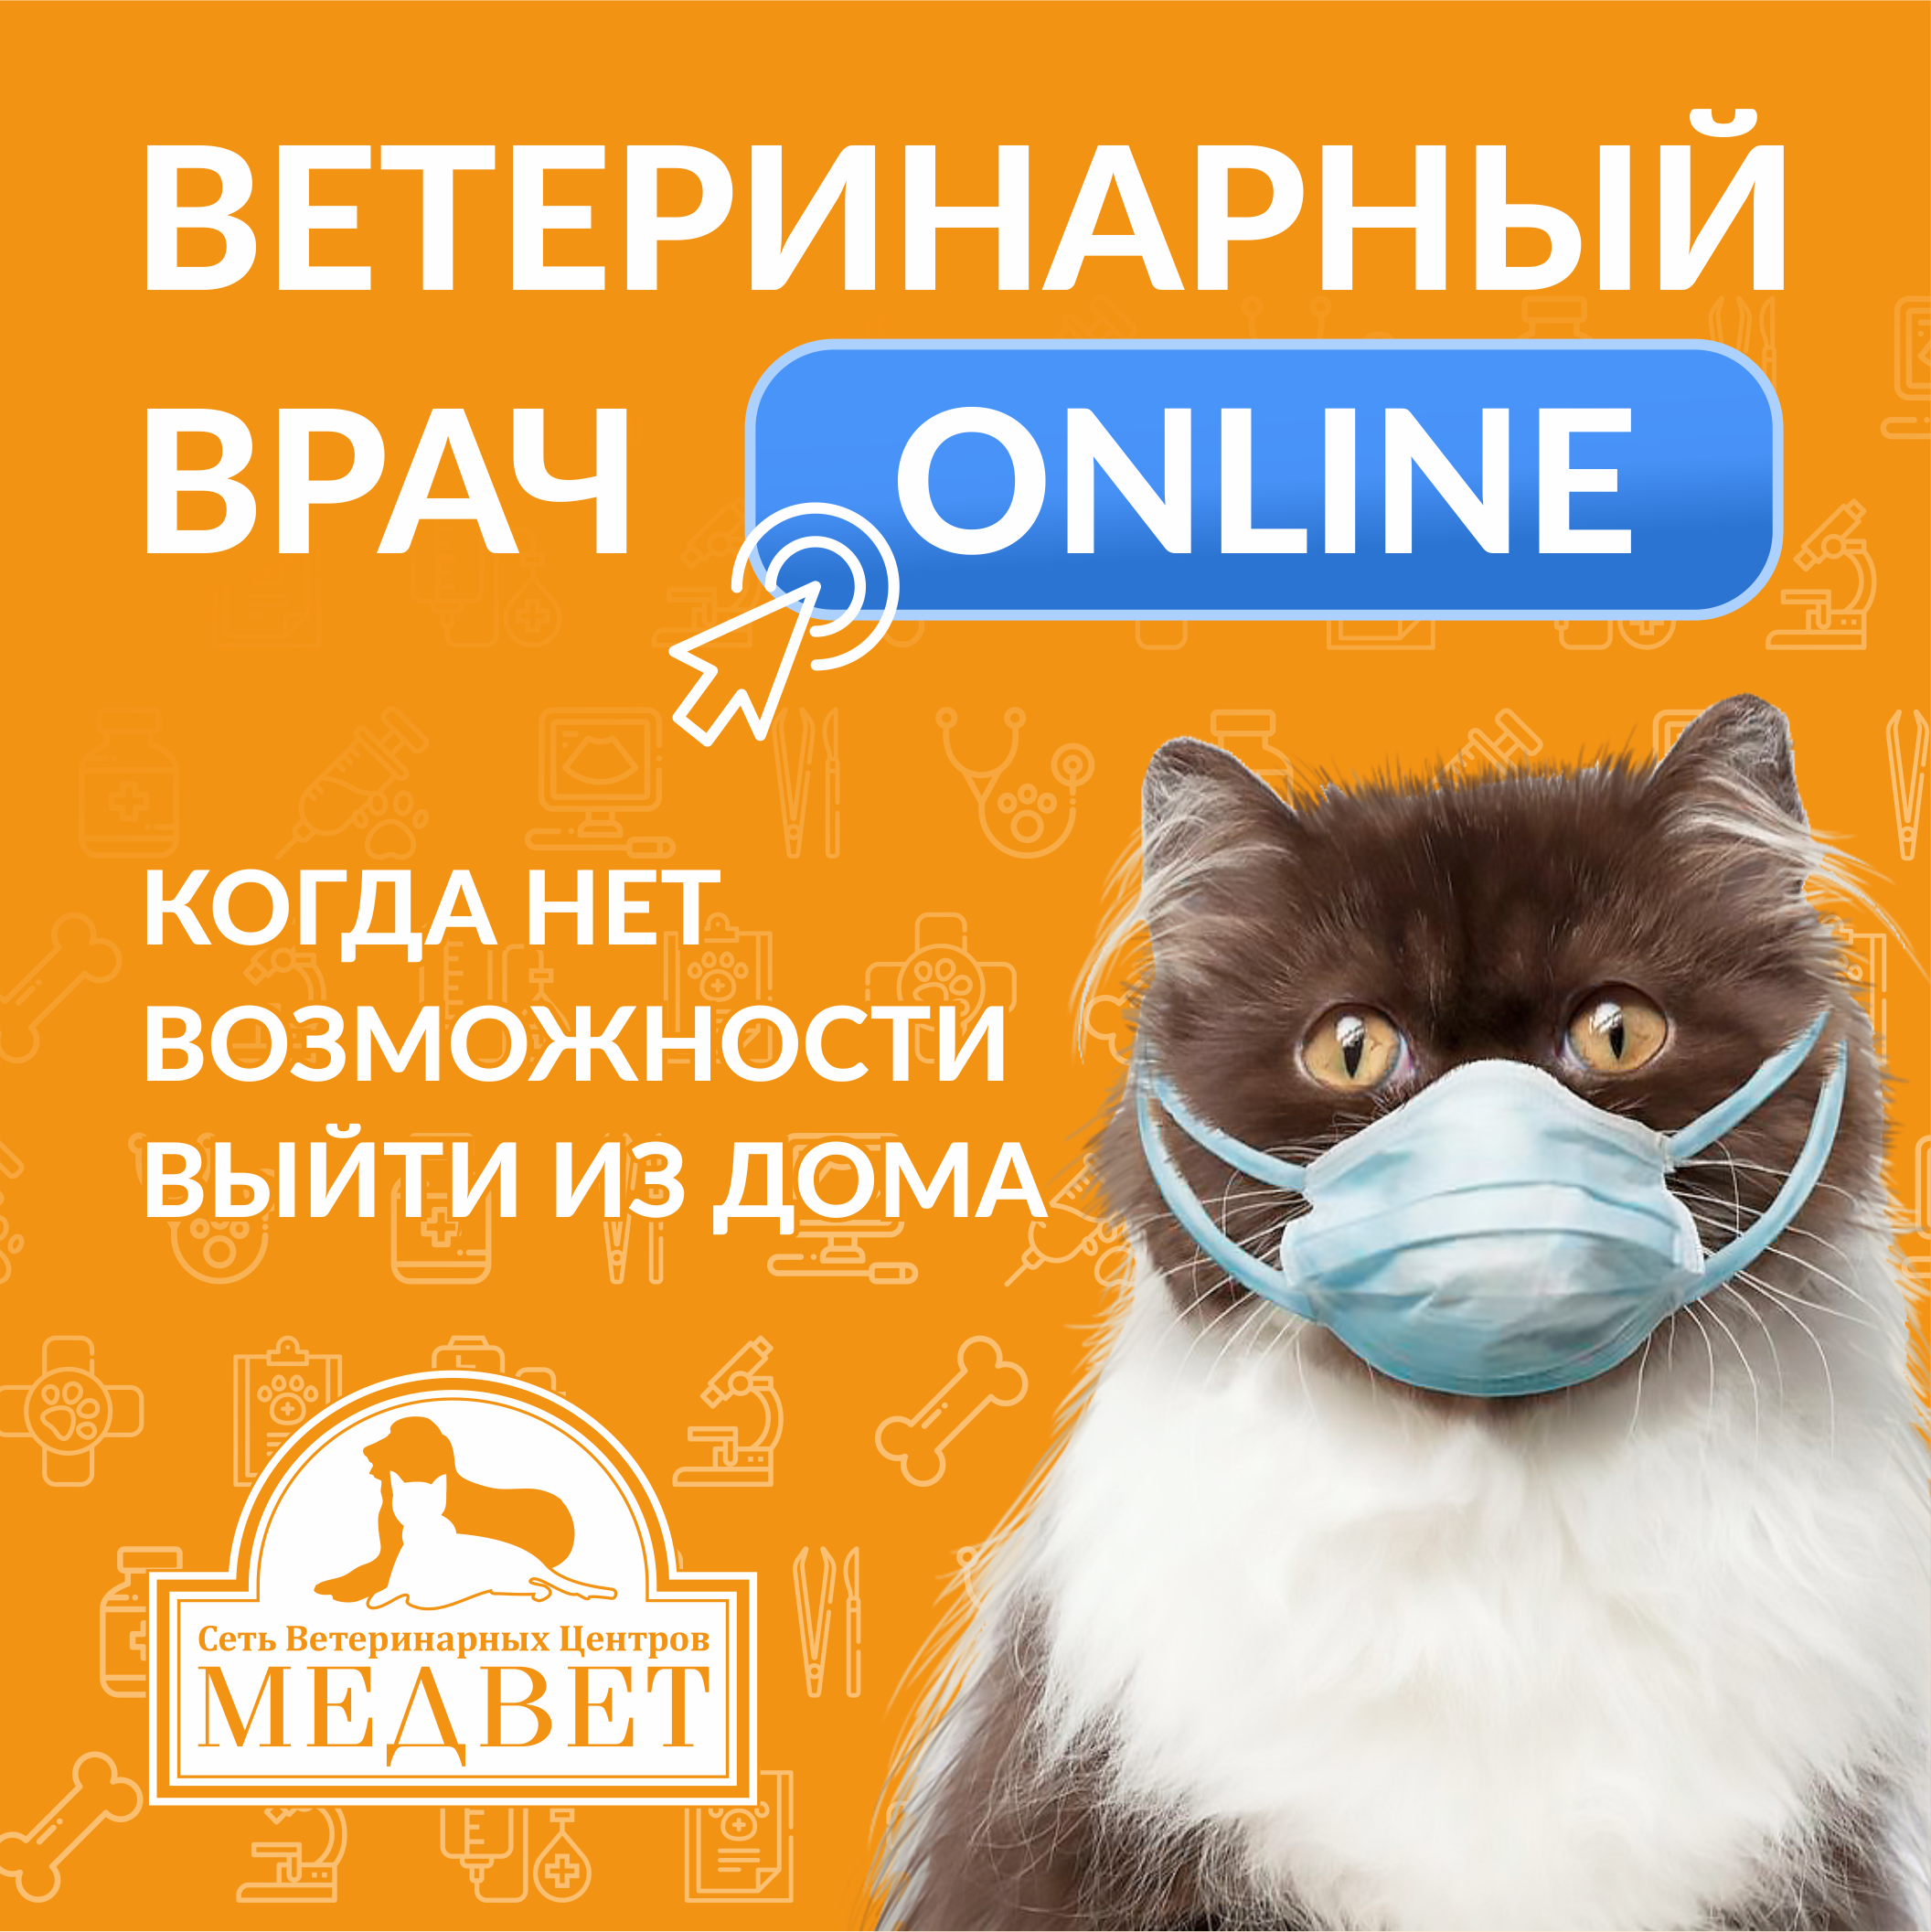 «Он-лайн консультация» ветеринарного врача